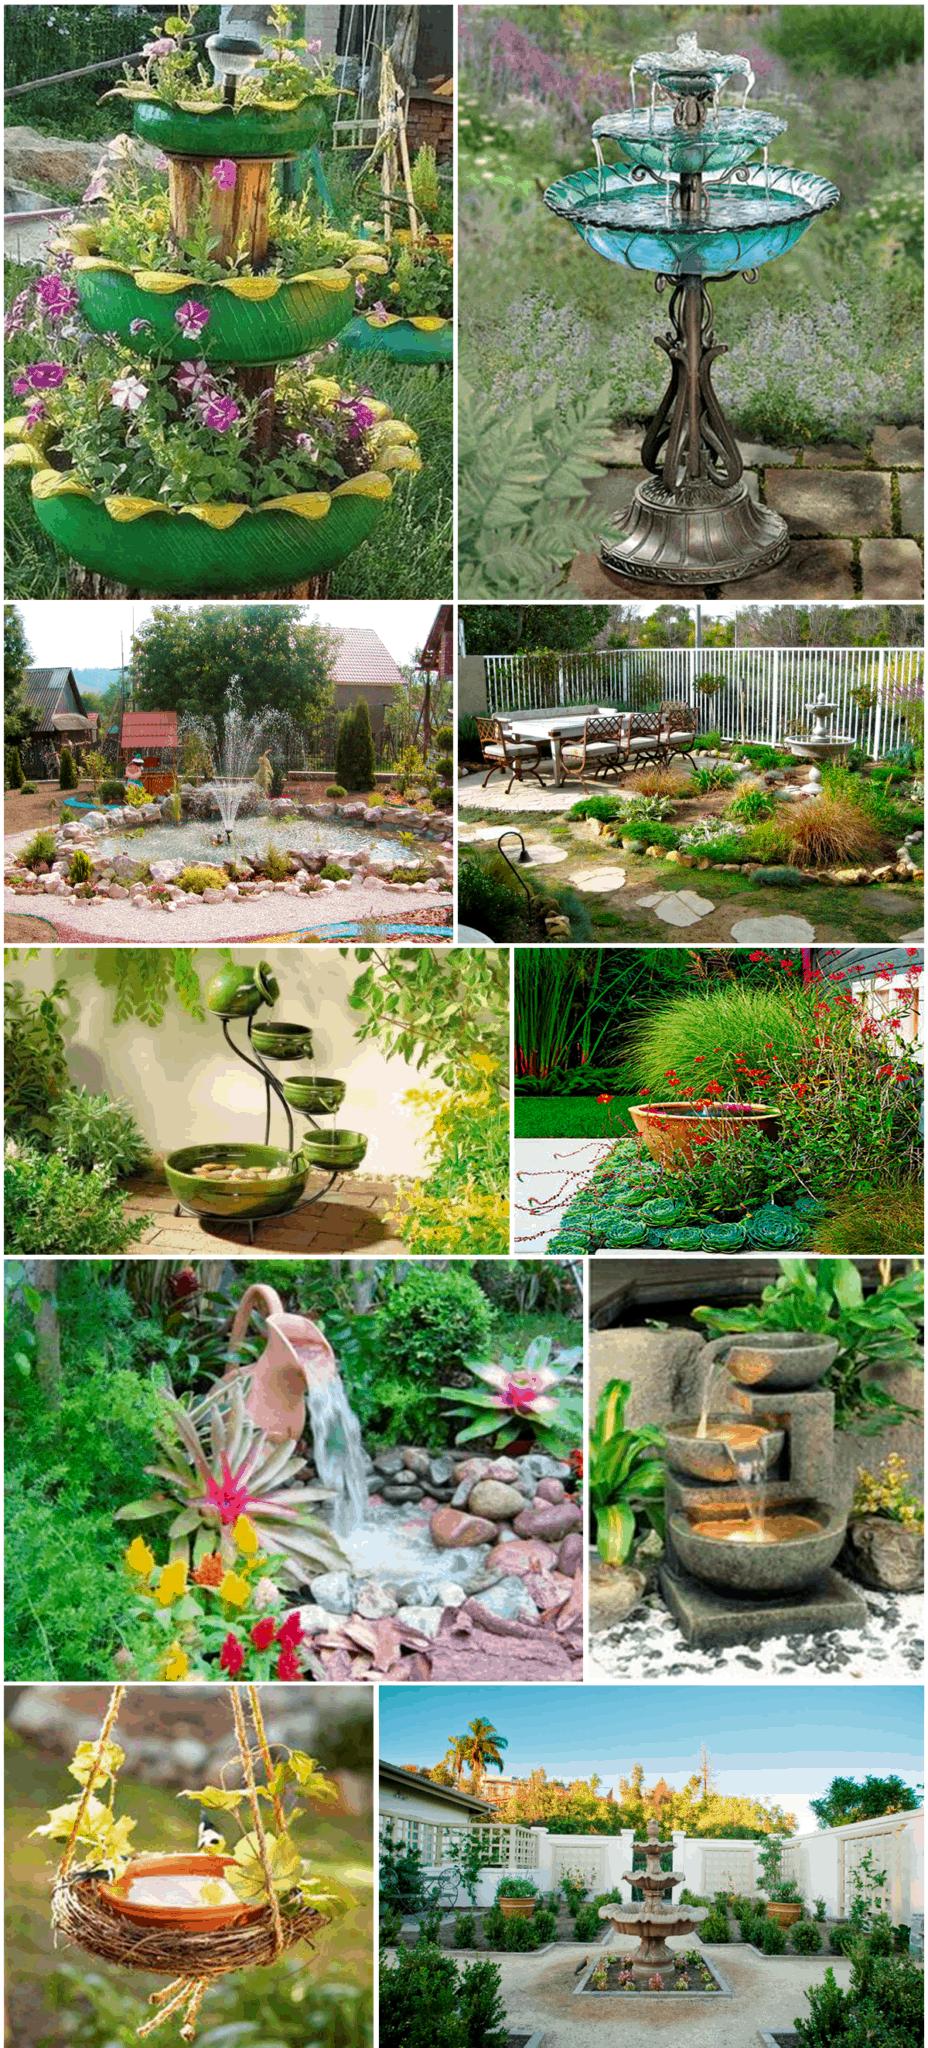 jardim-dos-sonhos-decorar-com-charme-chafariz-fonte